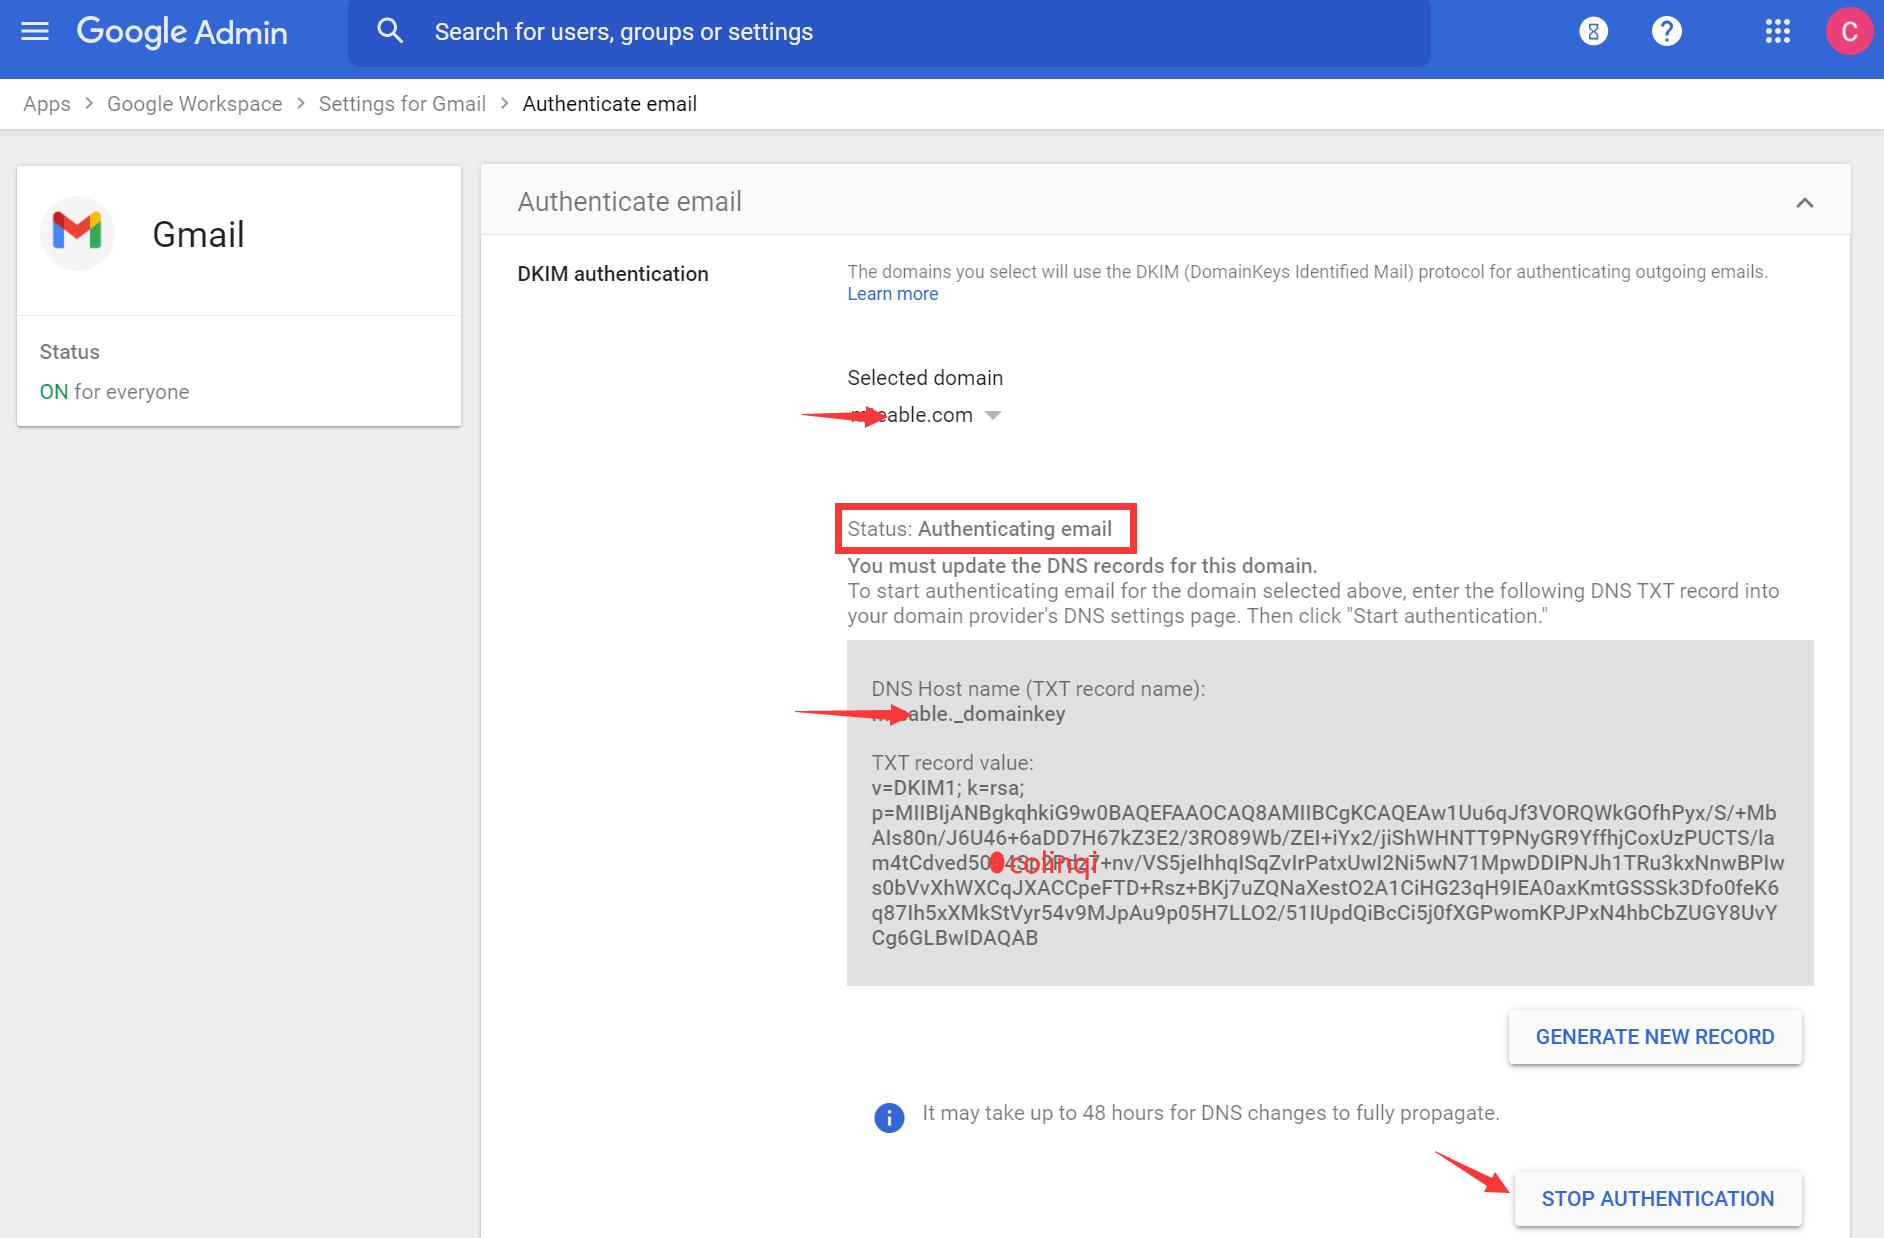 DKIM Gmail Authenticating